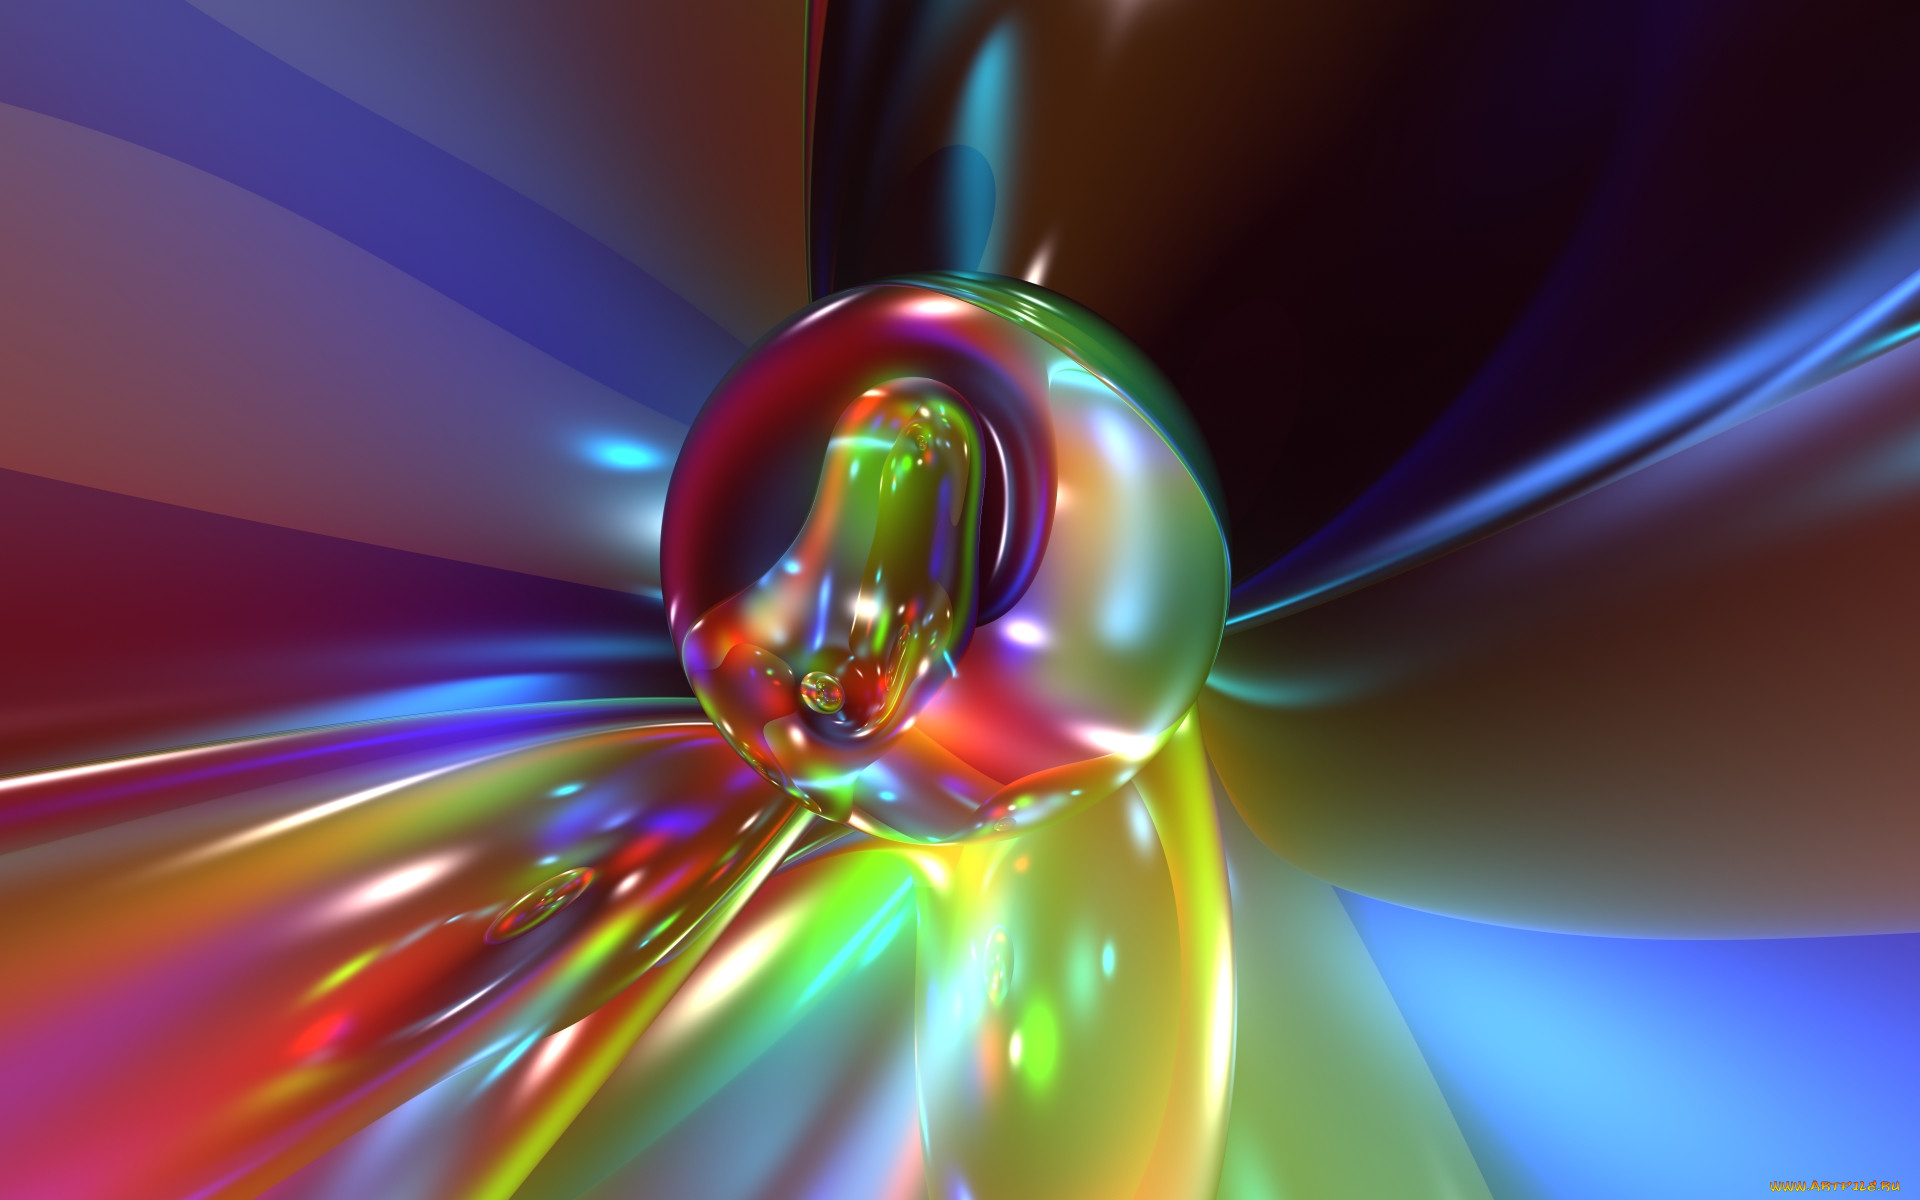 Сварочное стекло фотоаппарат филомене